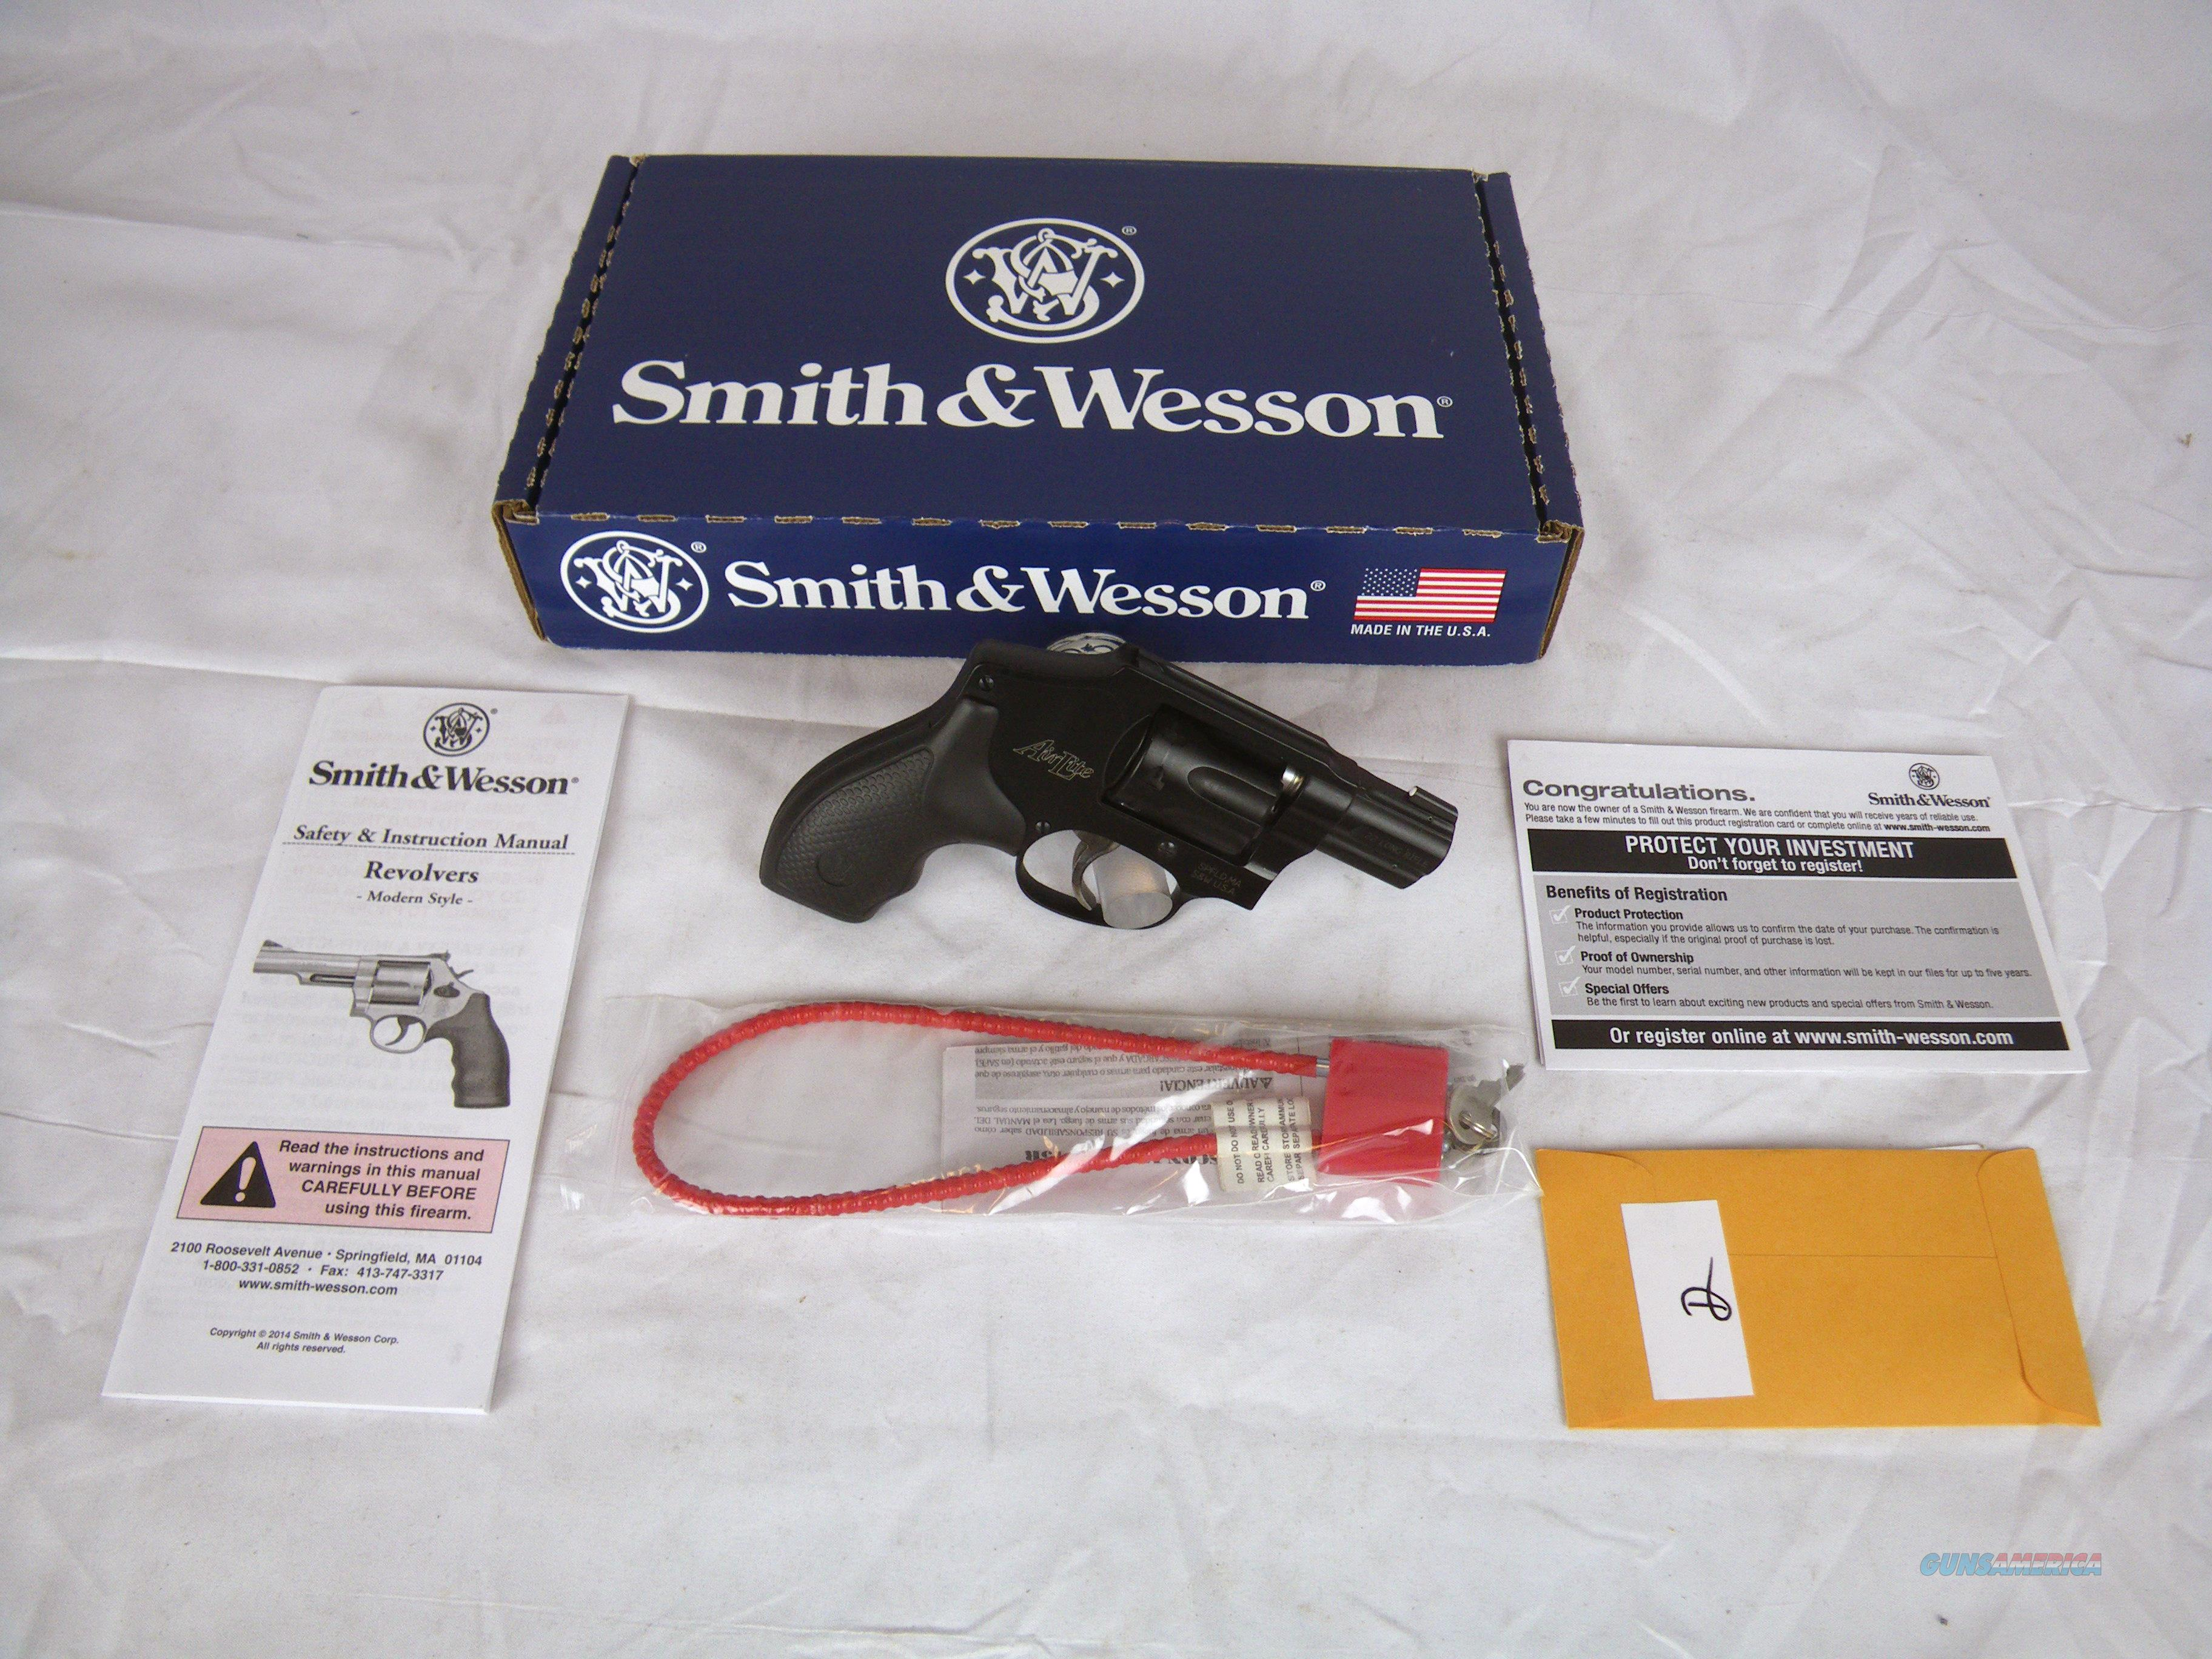 "Smith & Wesson 43C 22lr 1.875"" S&W J-Frame NEW #103043  Guns > Pistols > Smith & Wesson Revolvers > Pocket Pistols"